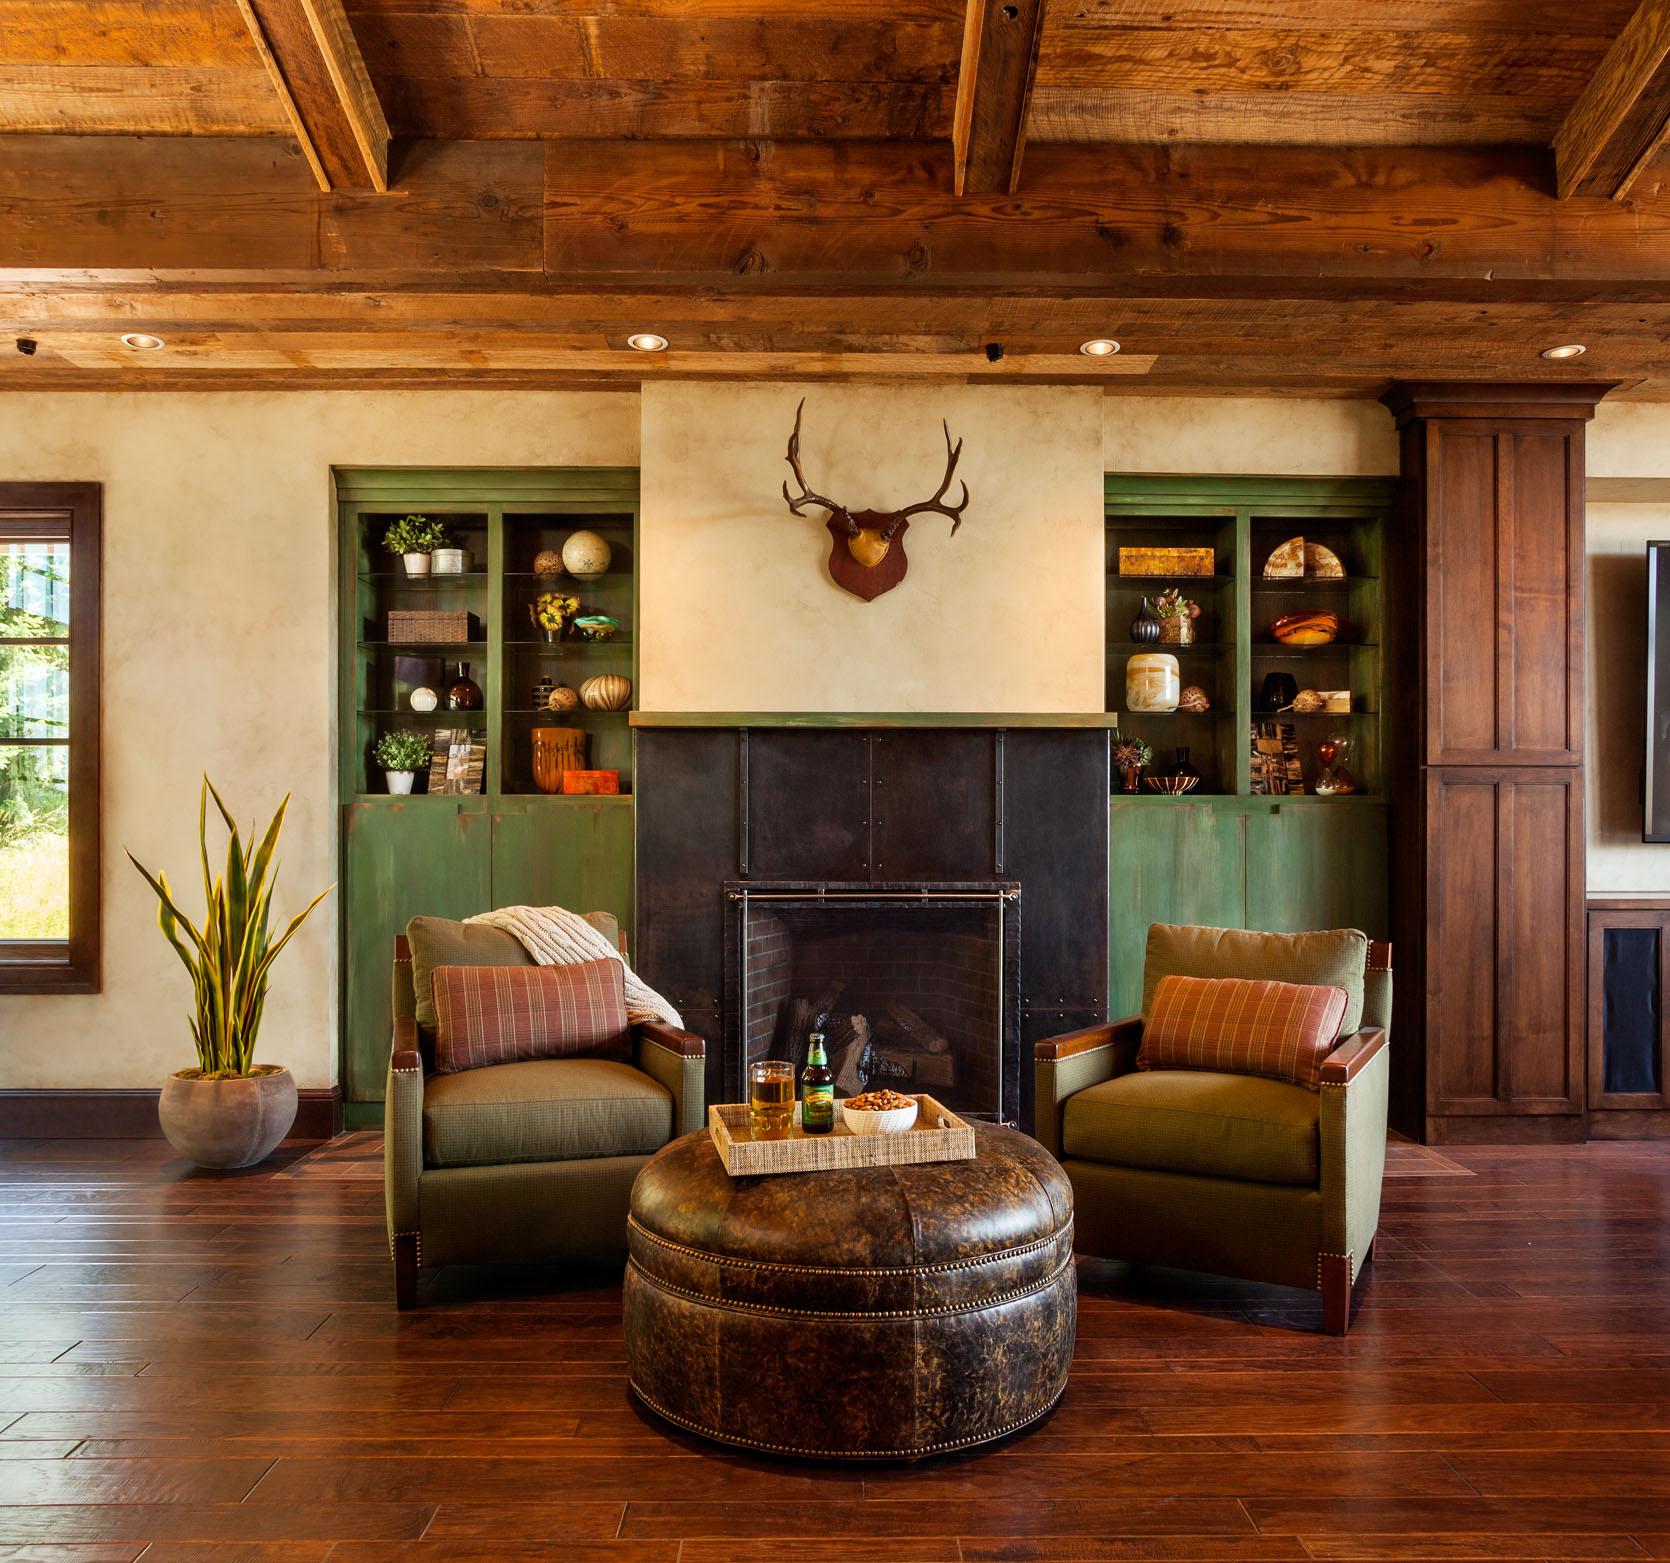 mw design workshop custom fireplace cladding